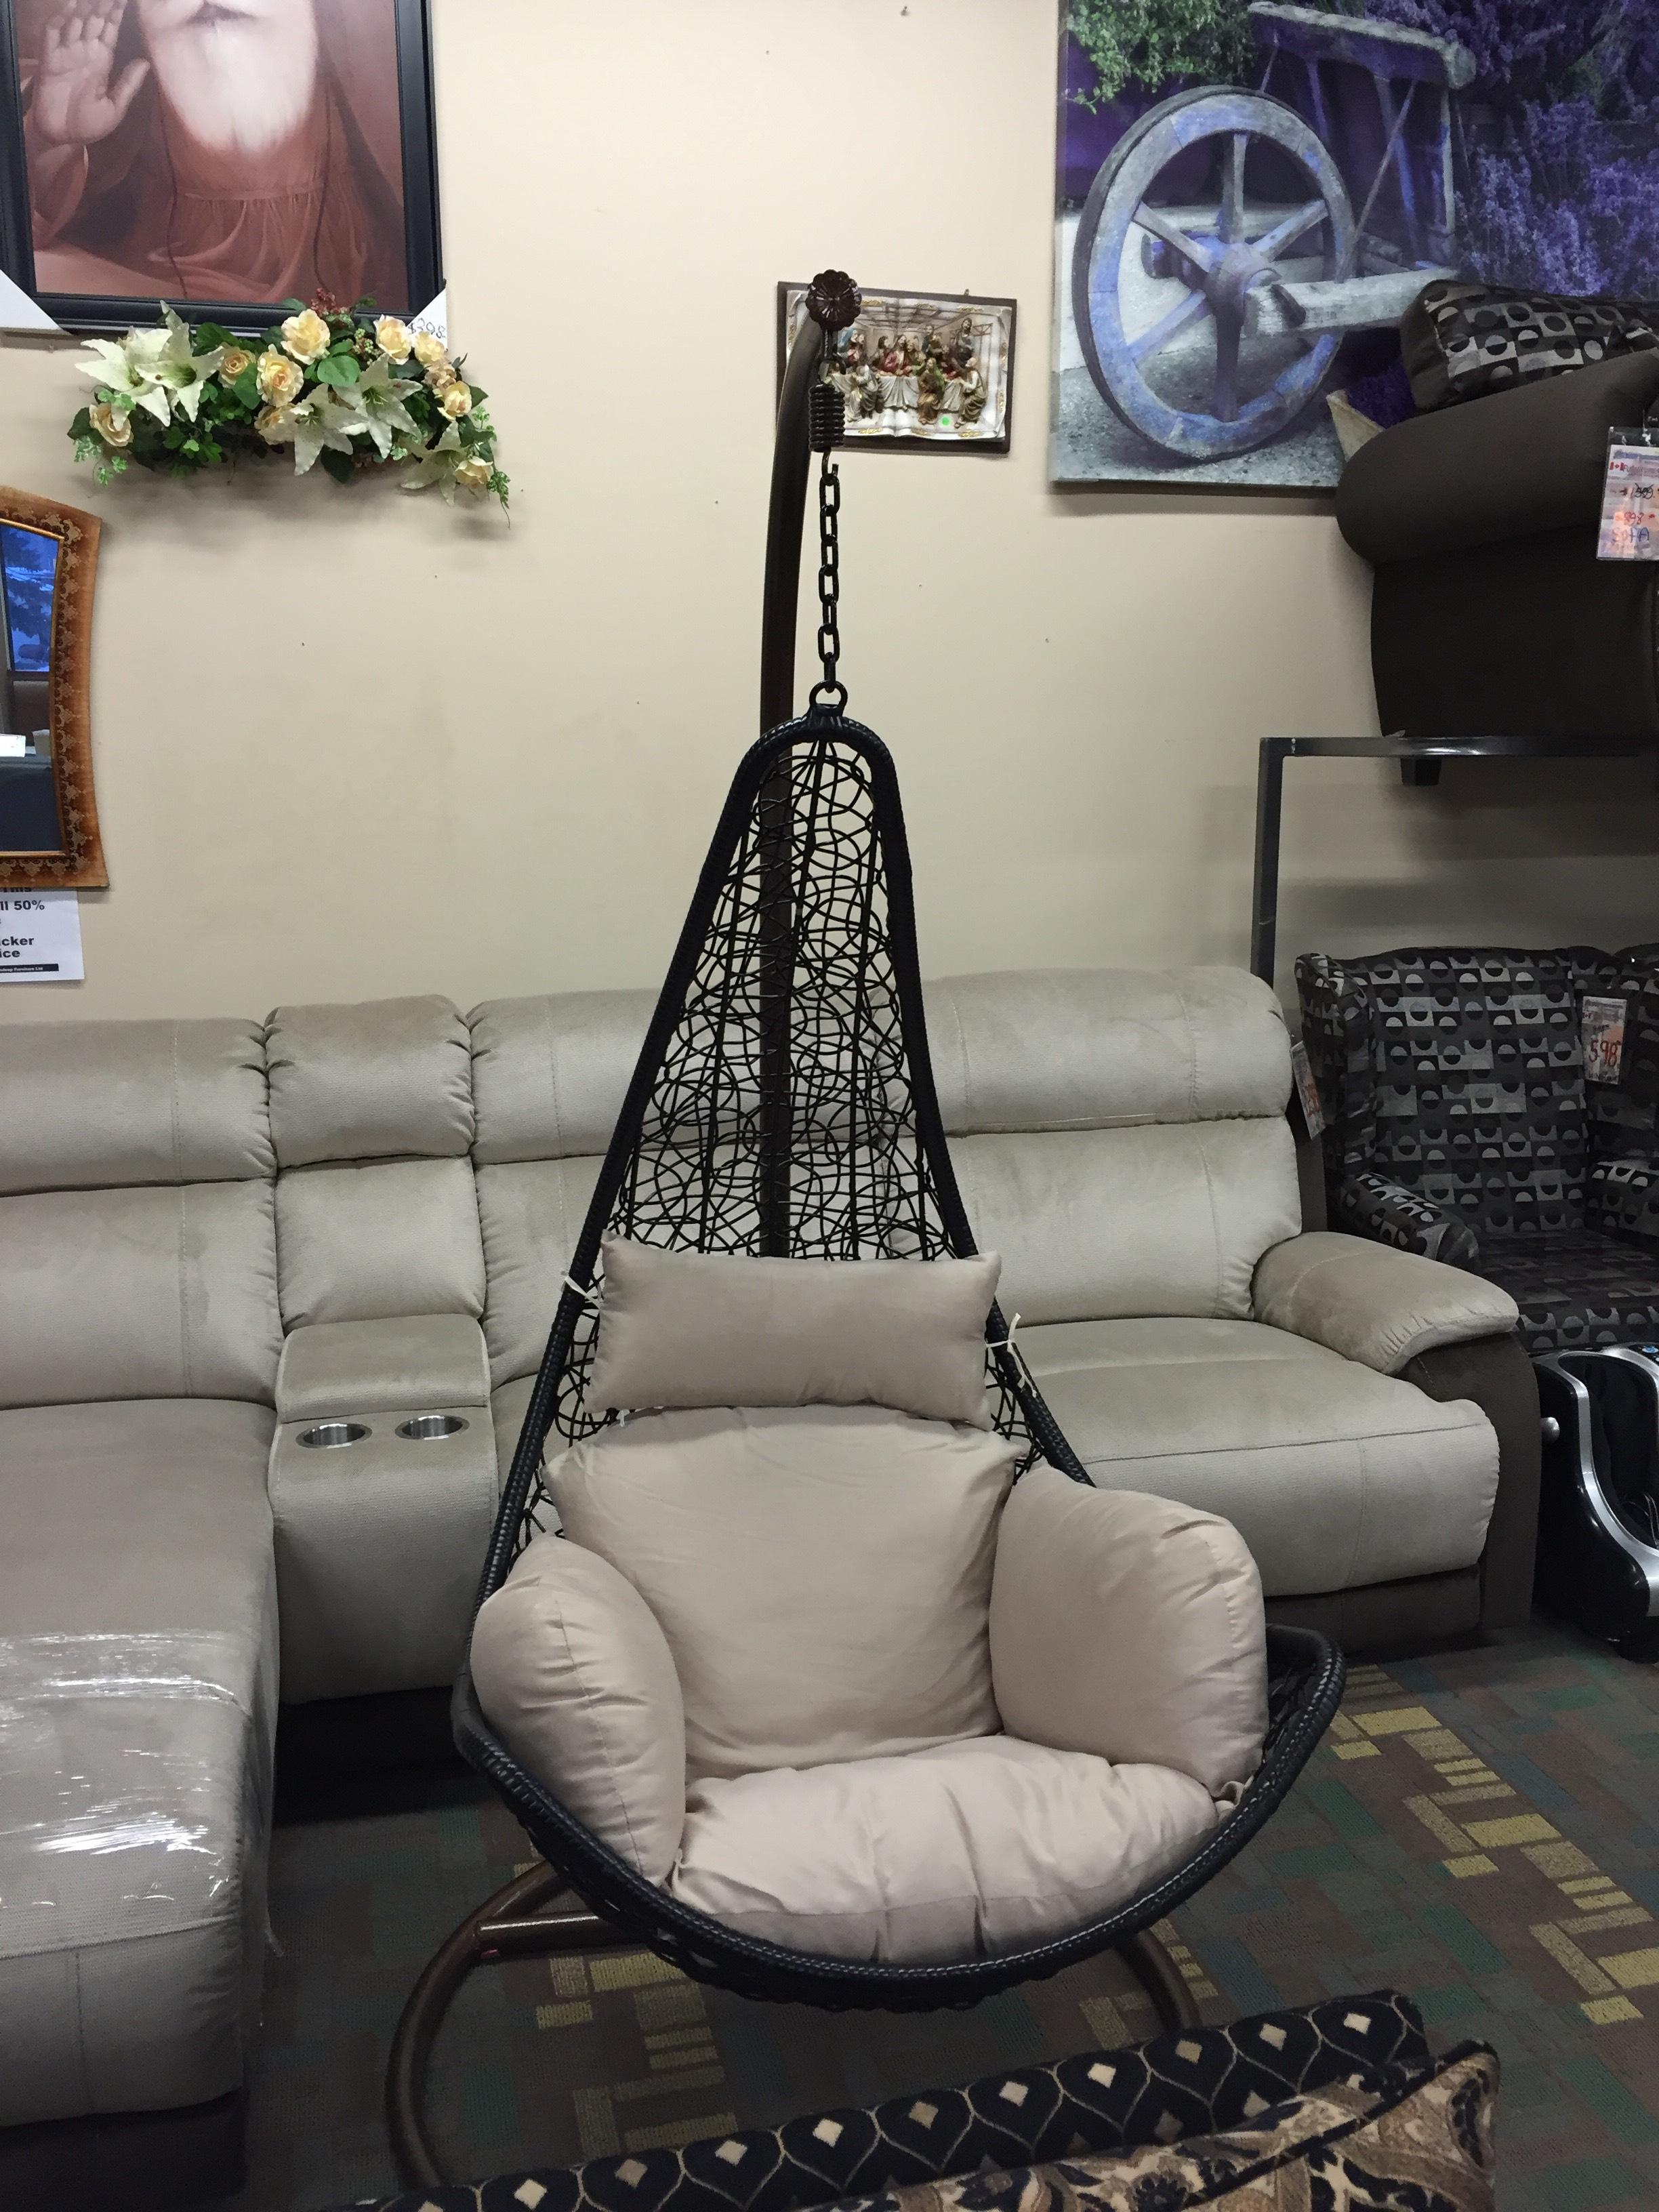 hanging chair edmonton wheelchair cad block 649b70a1 8479 47c3 8b57 5b0971437e5ee47f81ee af02 45b8